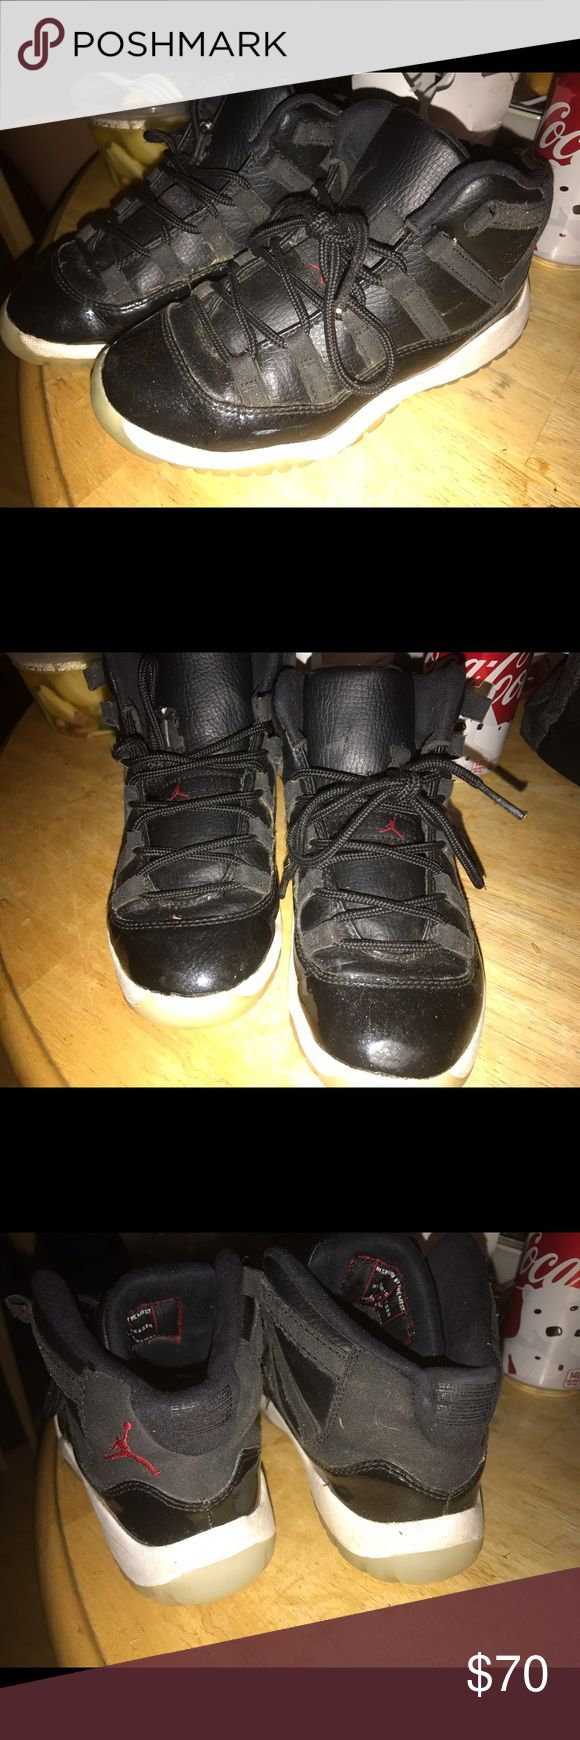 Kids Jordan 72-10s Kids size 13.5 Jordan Shoes Sneakers